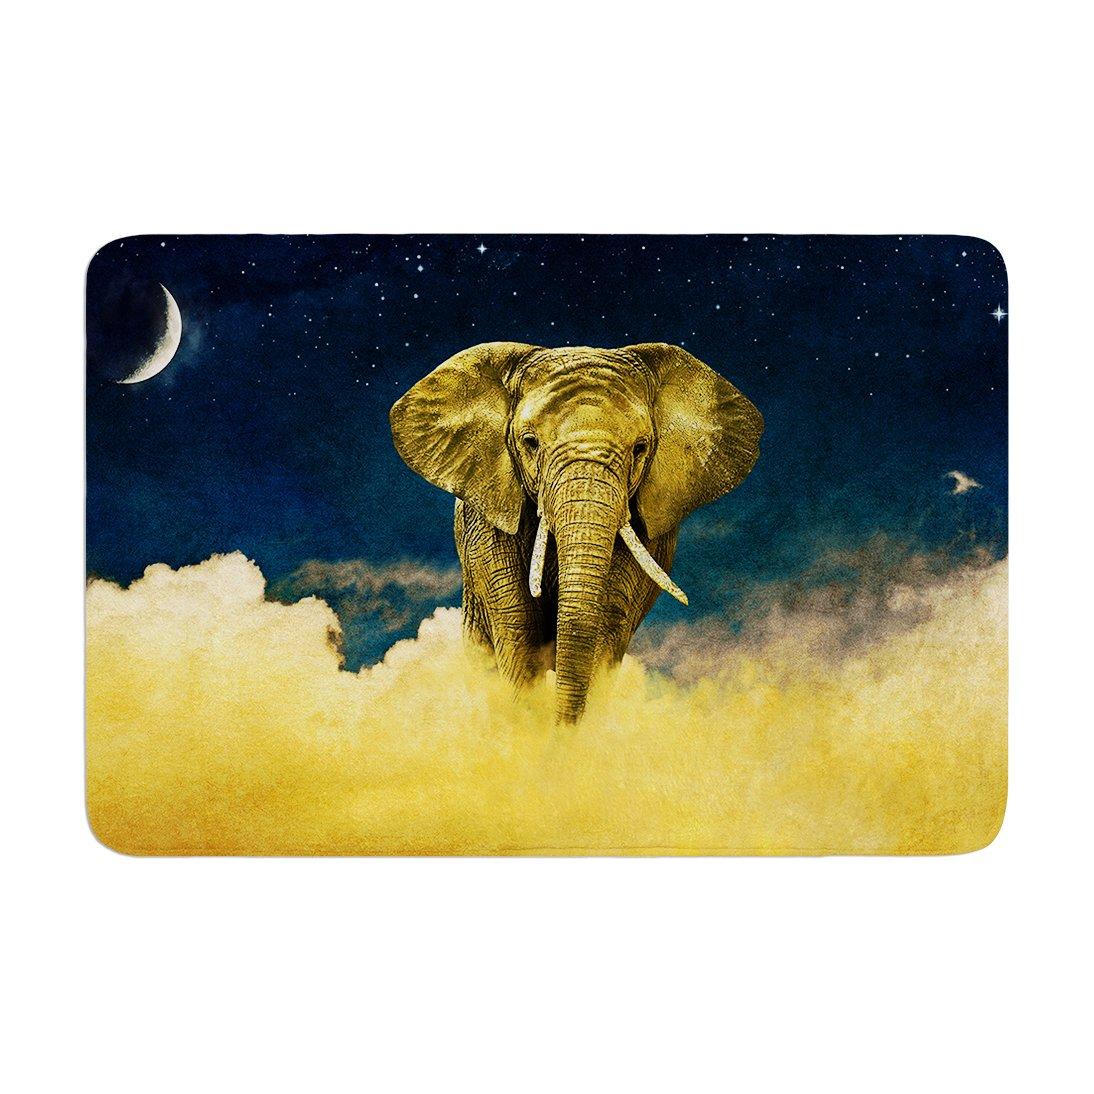 17 by 24 Kess InHouse Nick Atkinson Celestial Elephant Black Blue Memory Foam/Bath Mat